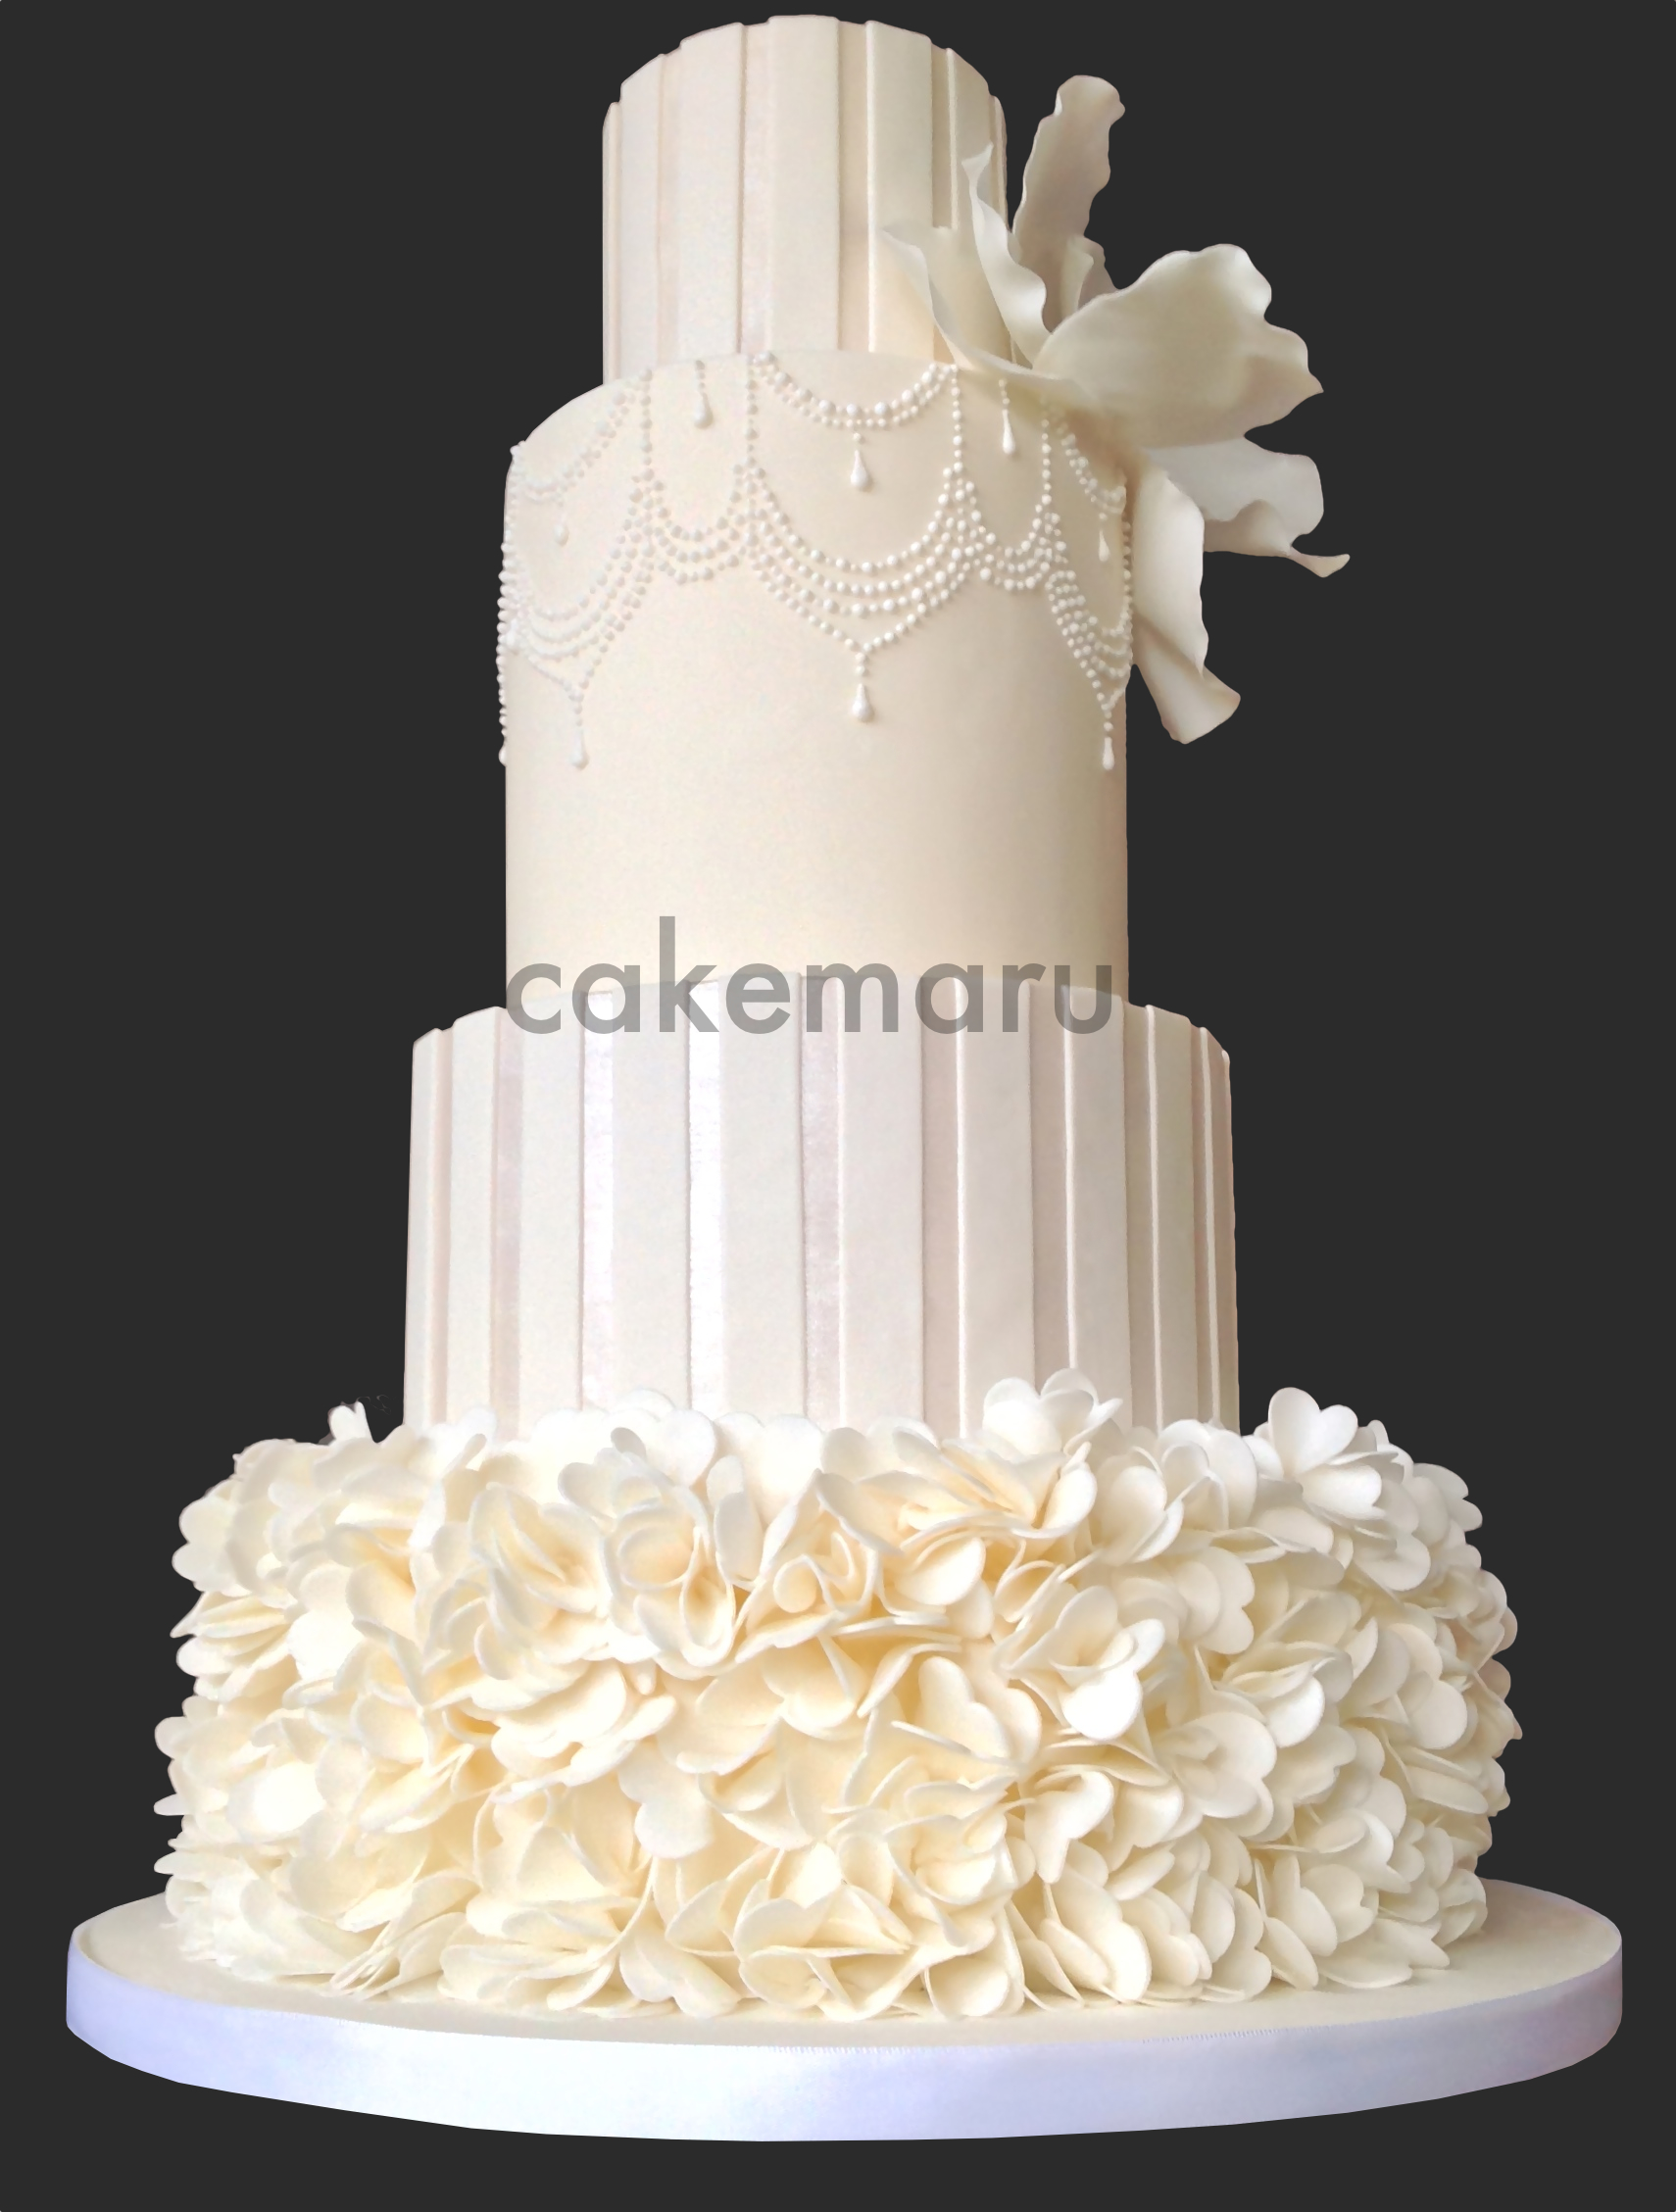 White Stripes and Ruffles Cake 1.jpg